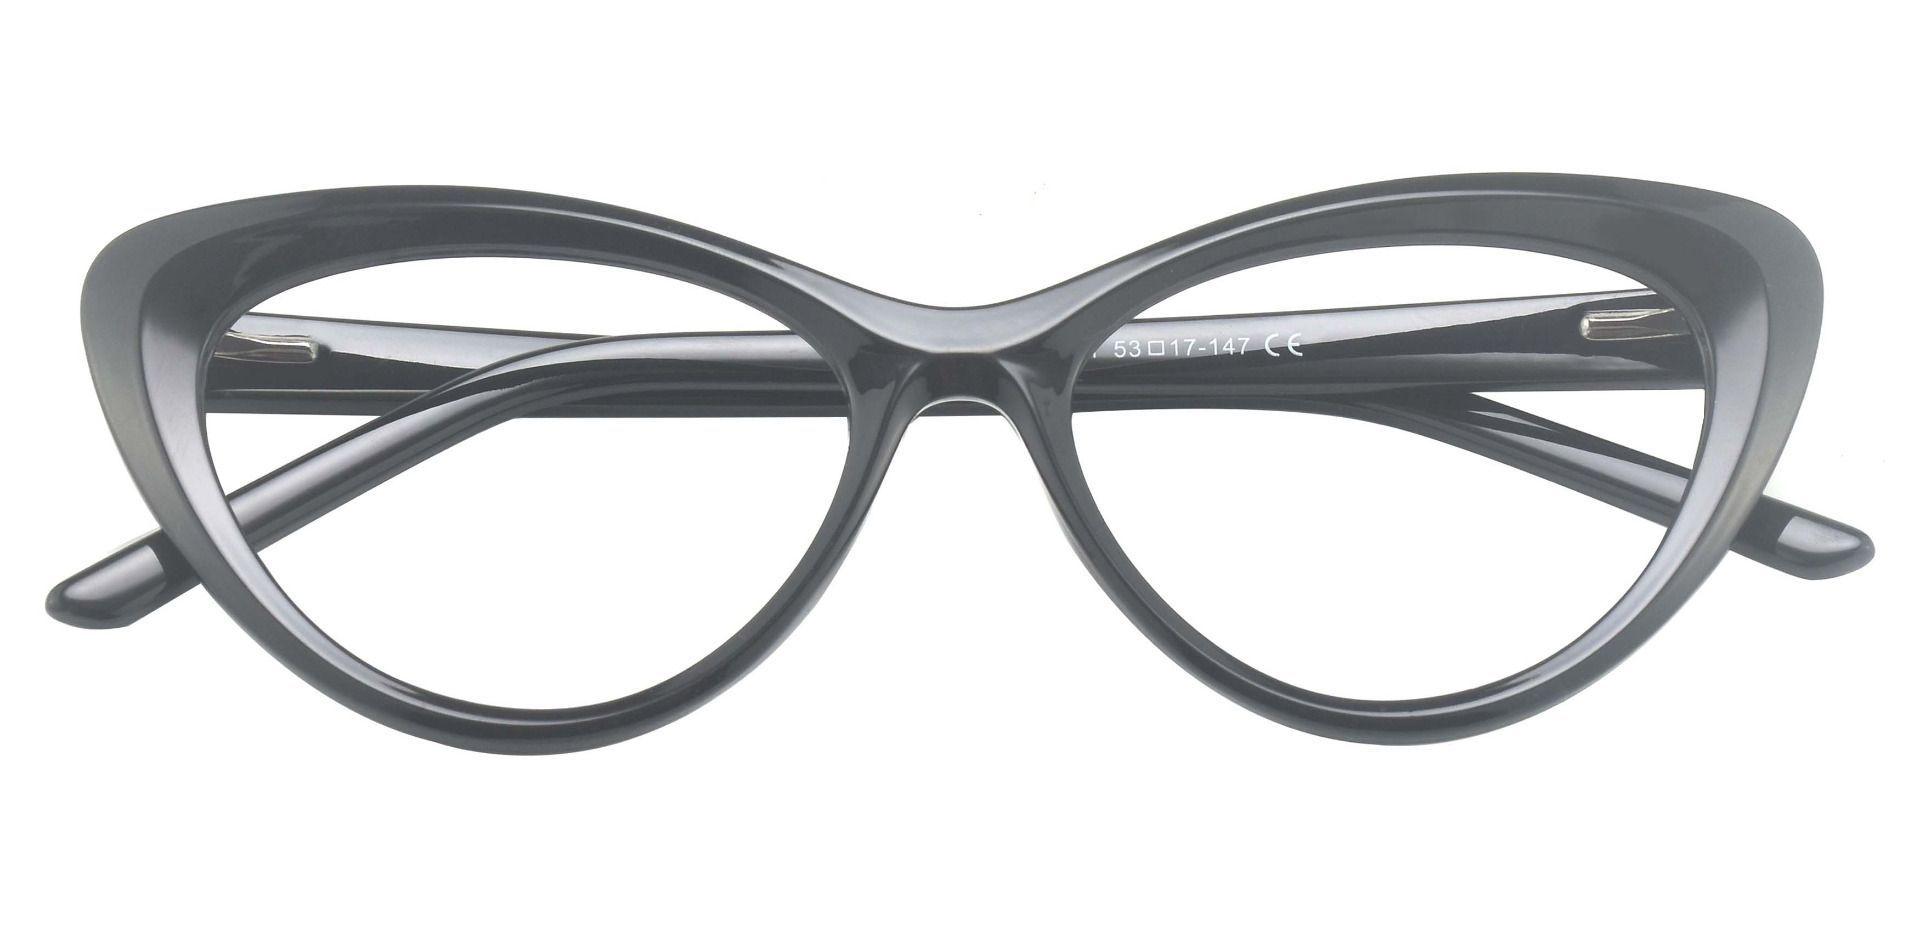 Gemini Cat Eye Prescription Glasses - Black